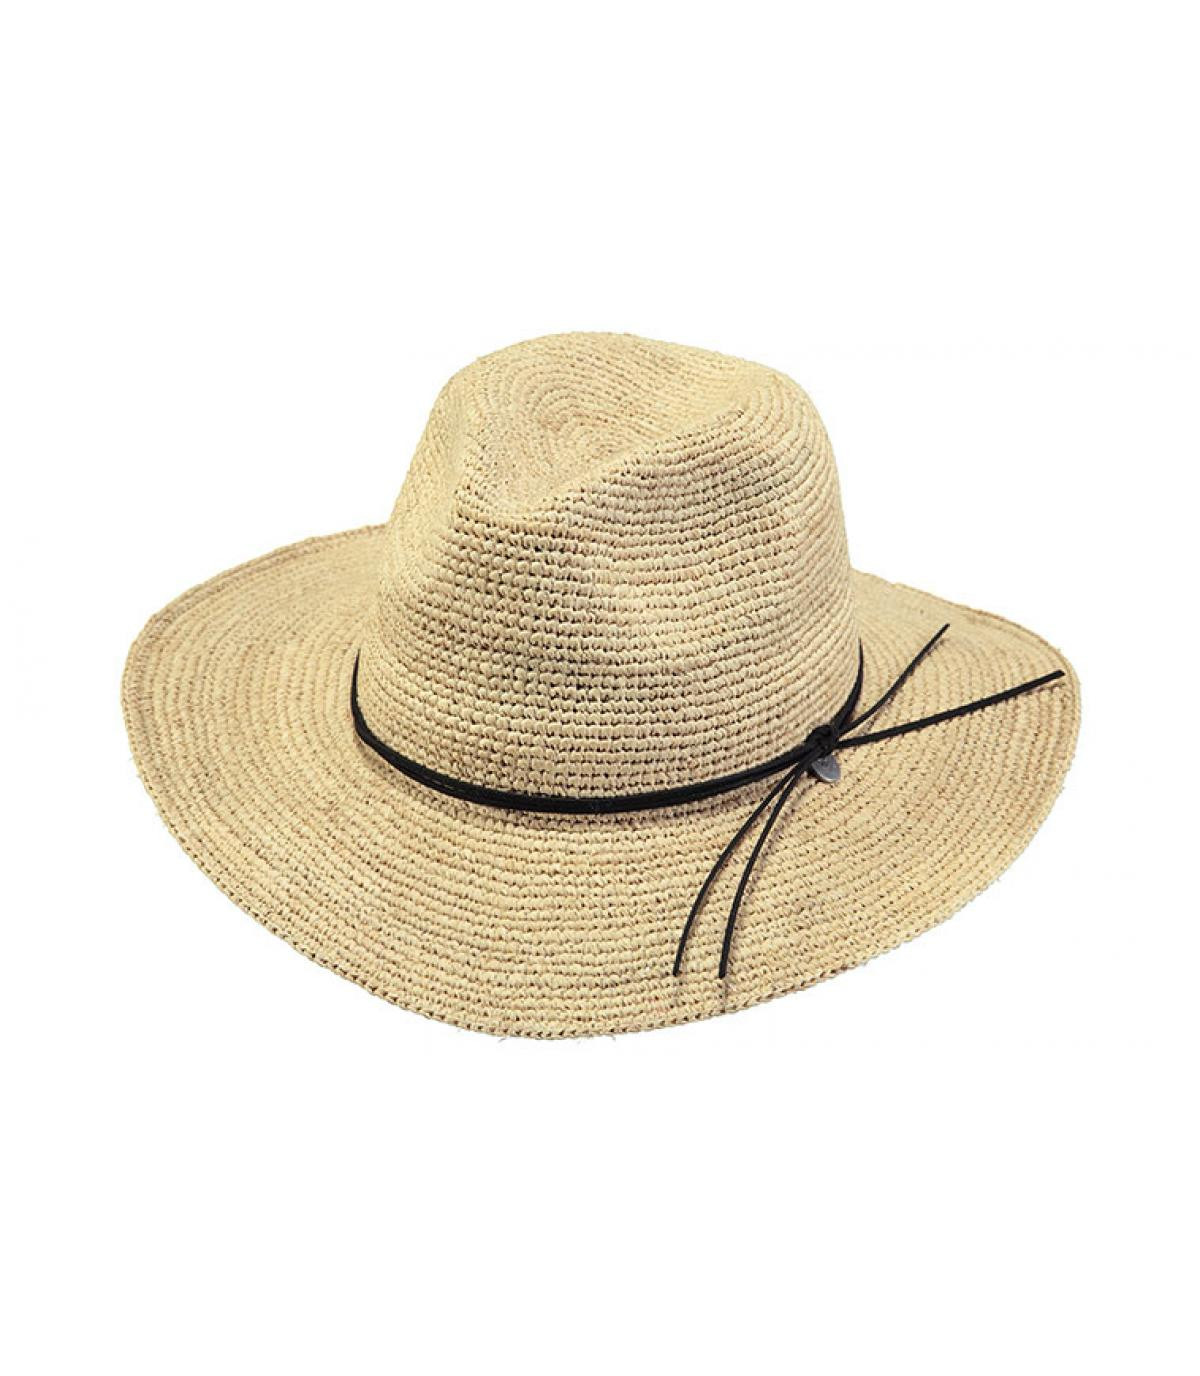 Detalles Celery Hat natural imagen 2